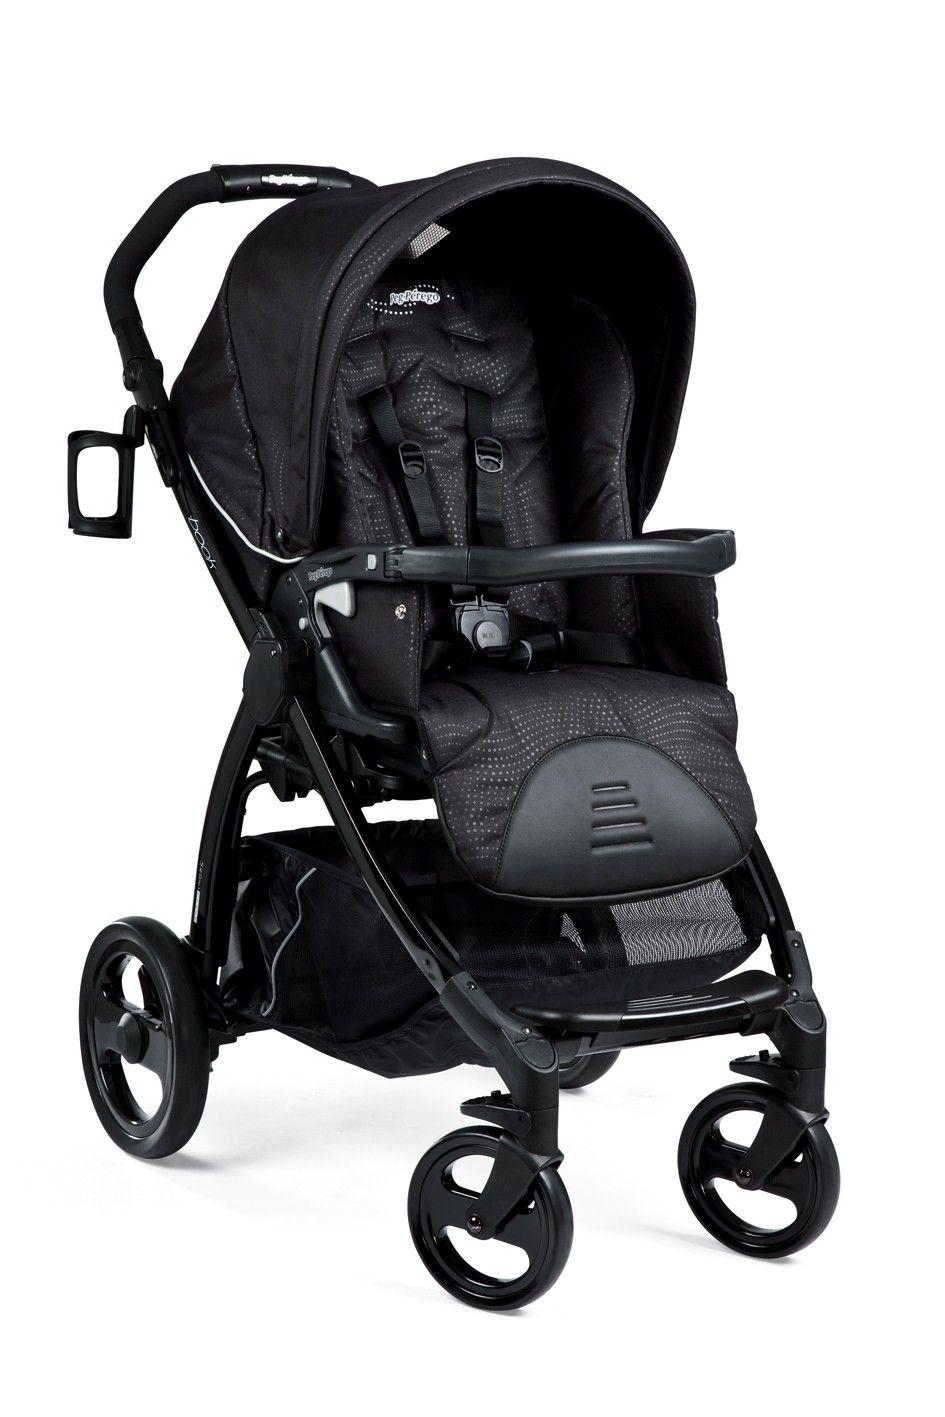 PegPerego Book Plus Stroller Galaxy Baby Jogger Prams